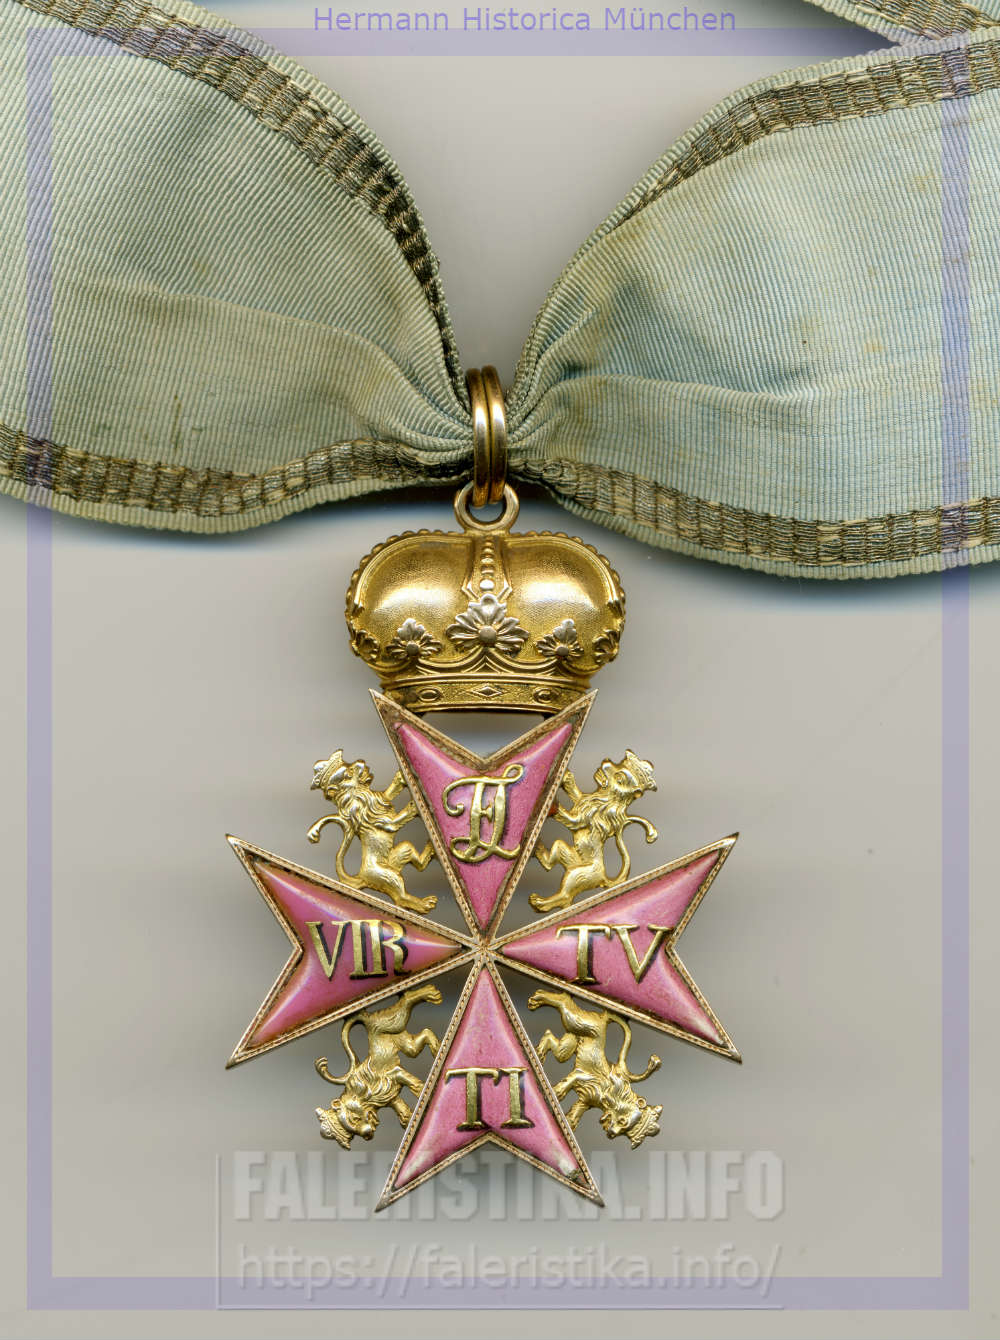 Знак ордена «За военные заслуги» (Pour la vertu militaire Orden am Band), ландграфство Гессен-Кассель, 1769. Hermann Historica München